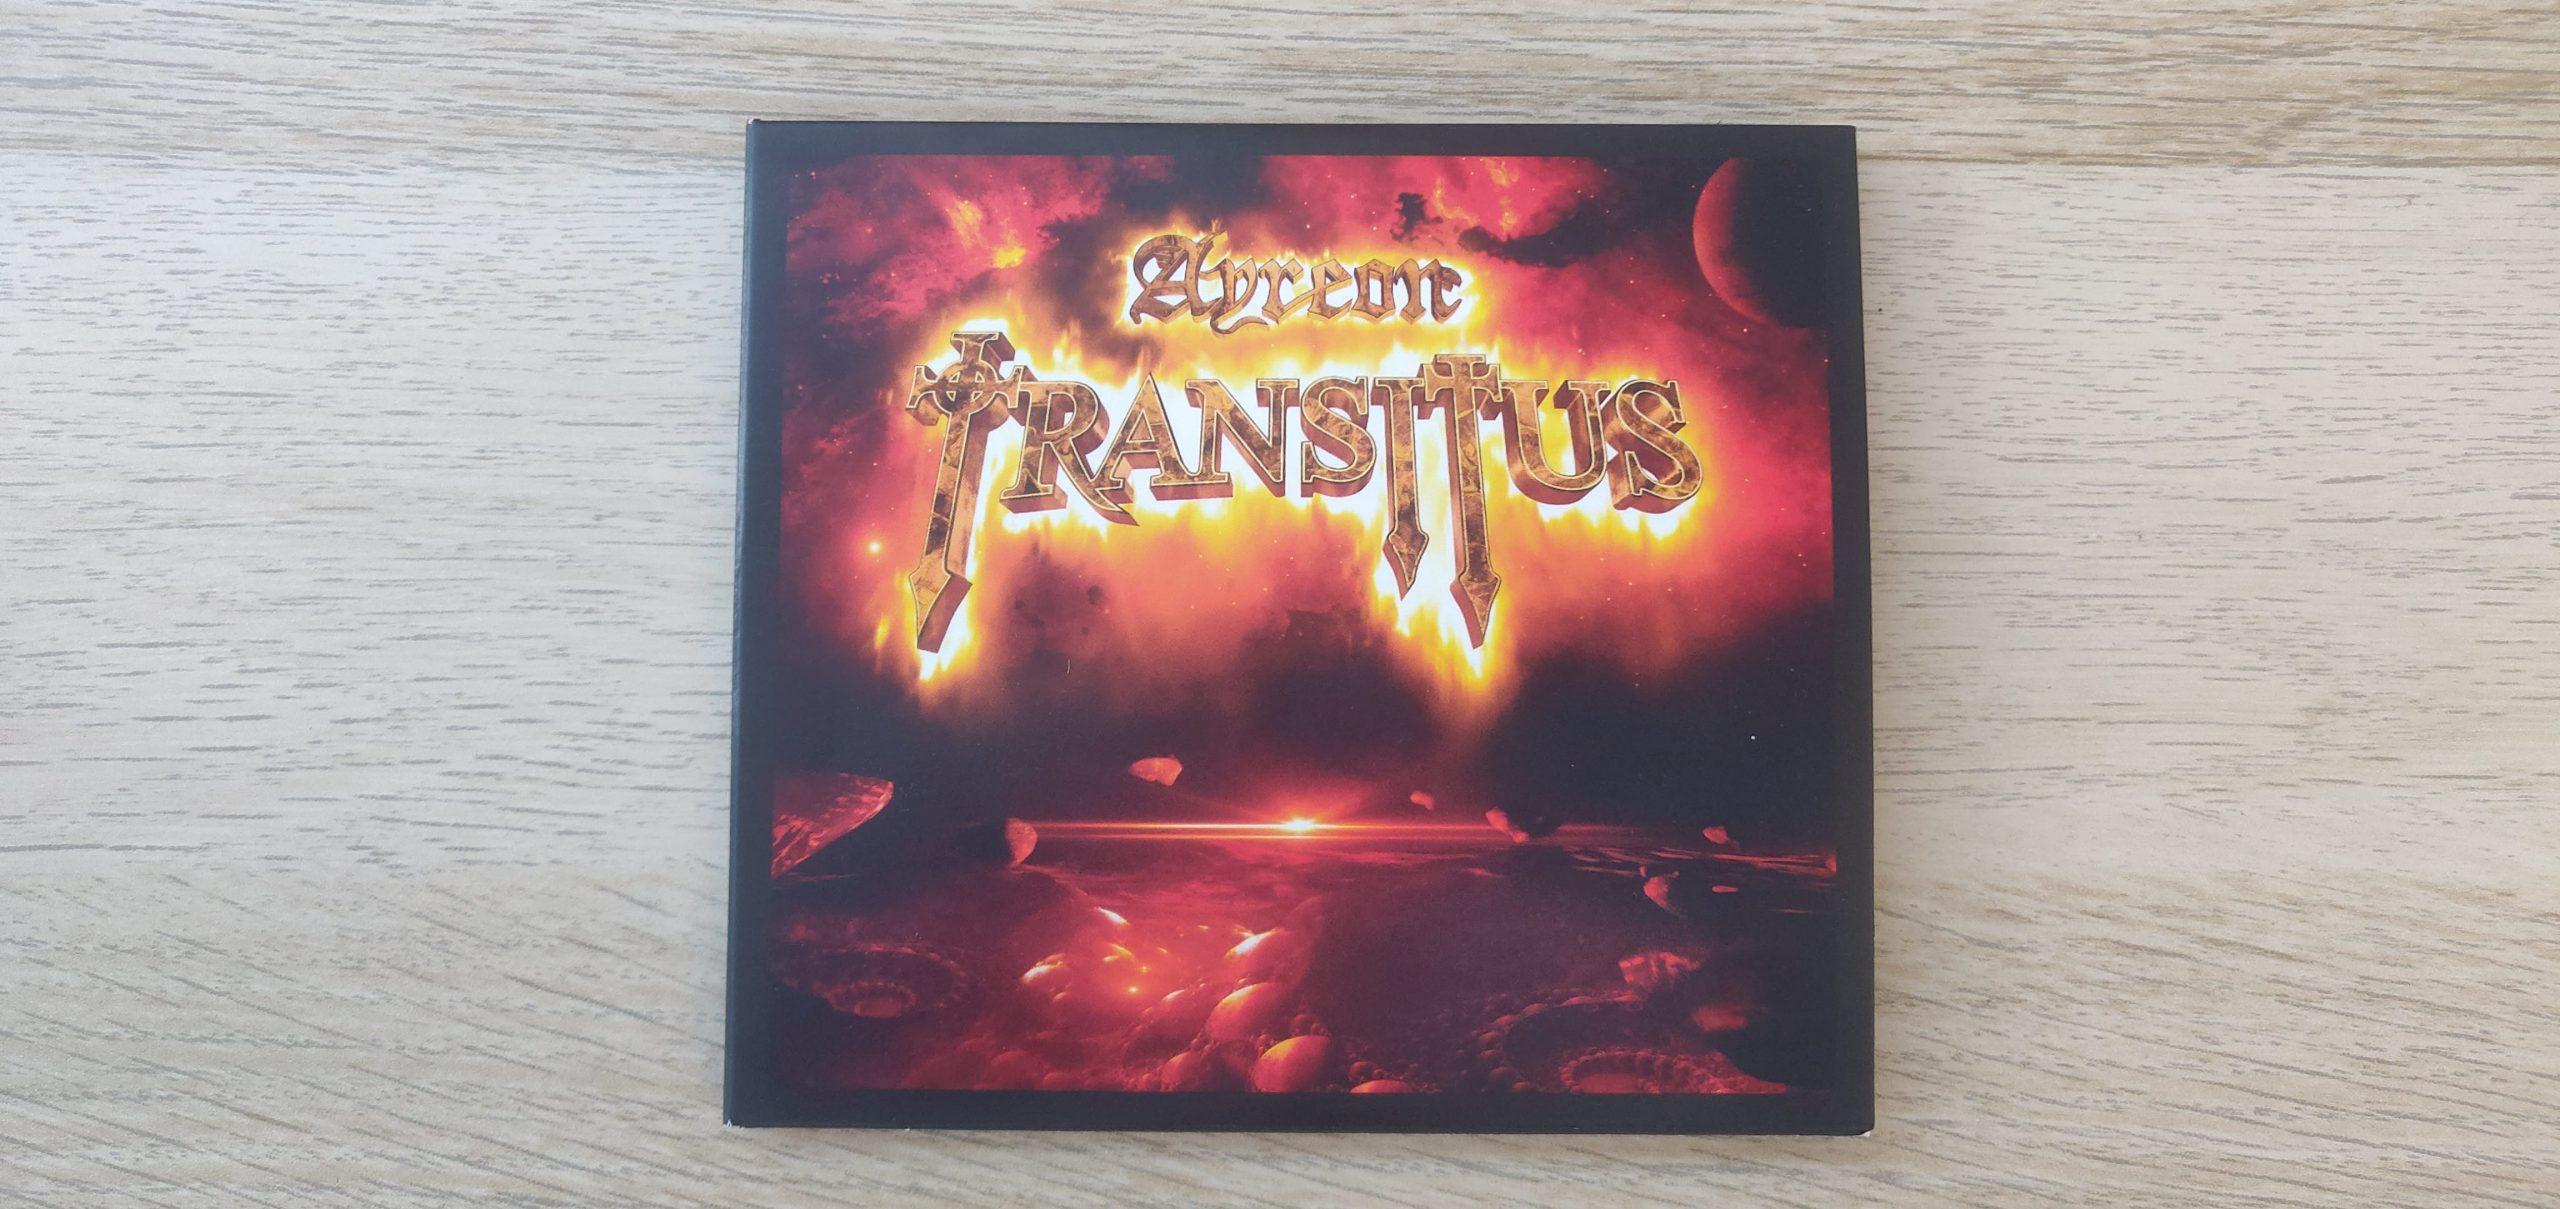 Ayreon 'Transitus' Album Cover